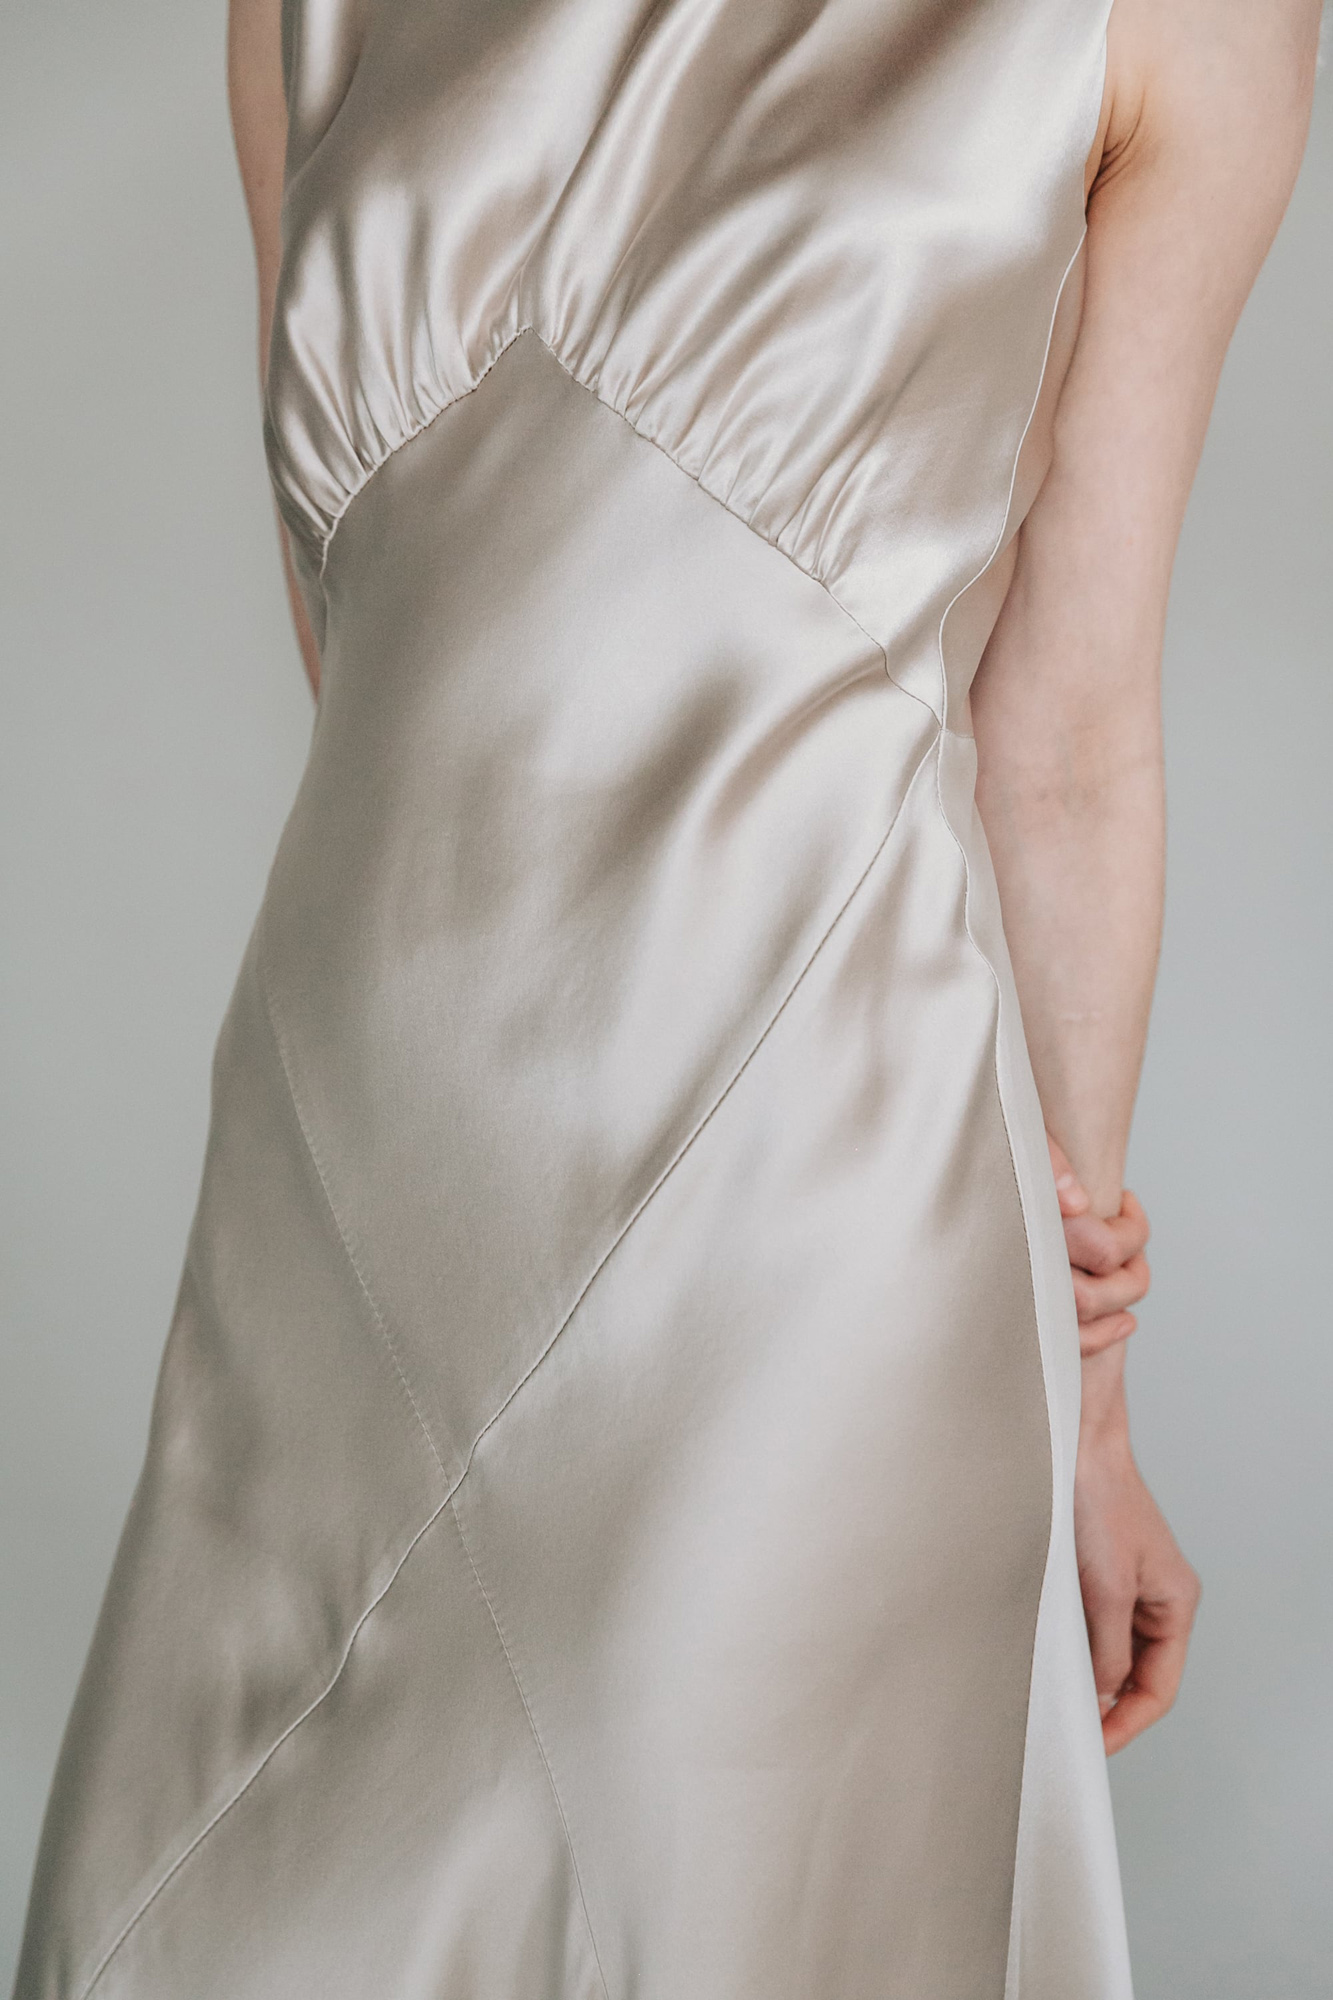 Kate-Beaumont-Sheffield-Honeysuckle-Bias-Cut-Silk-Panelled-Wedding-Gown-9.jpg